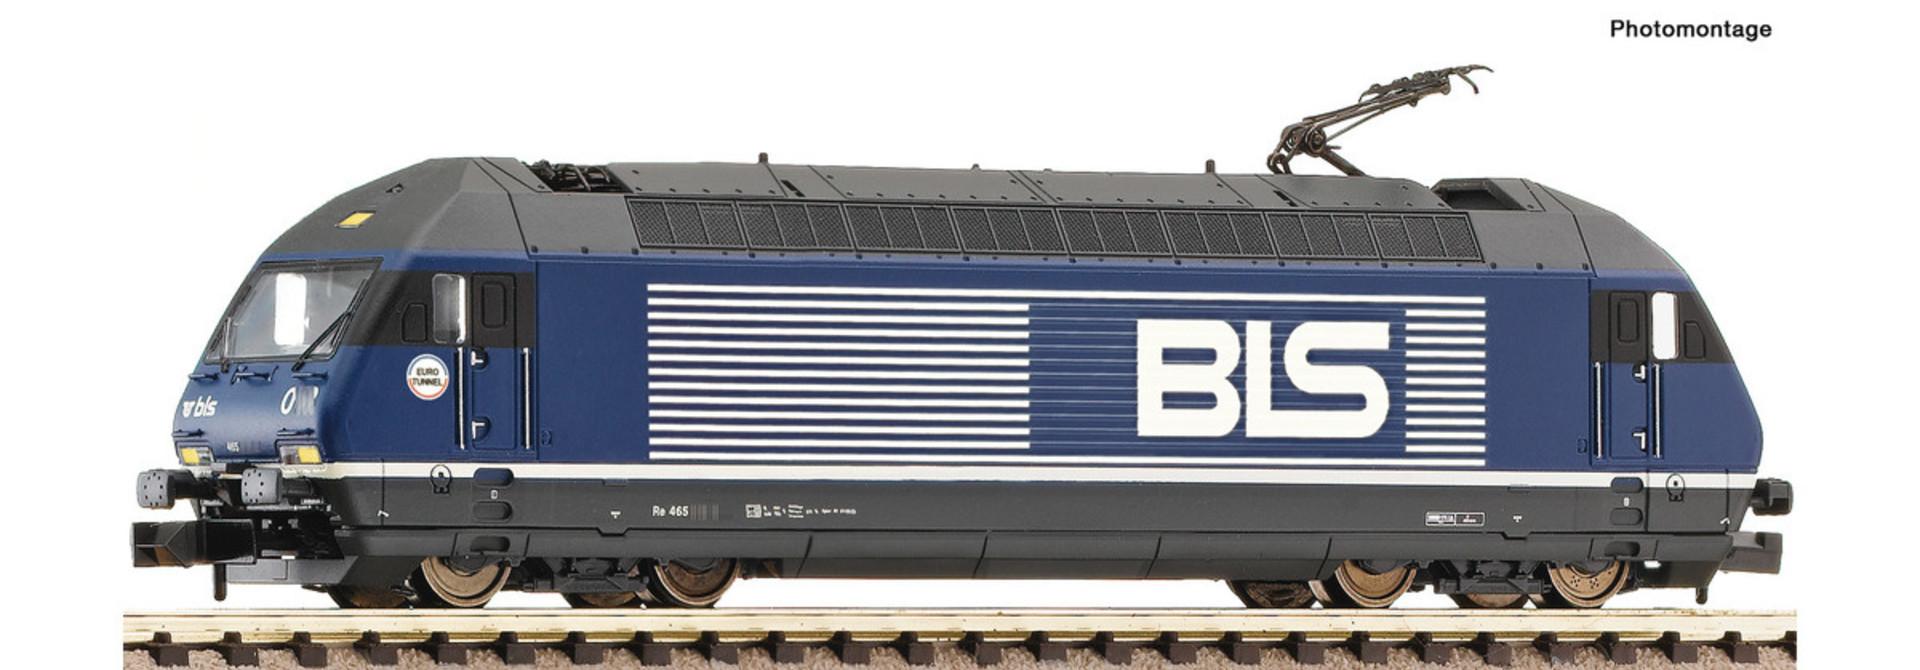 731471 E-Lok Re 465 BLS Snd.